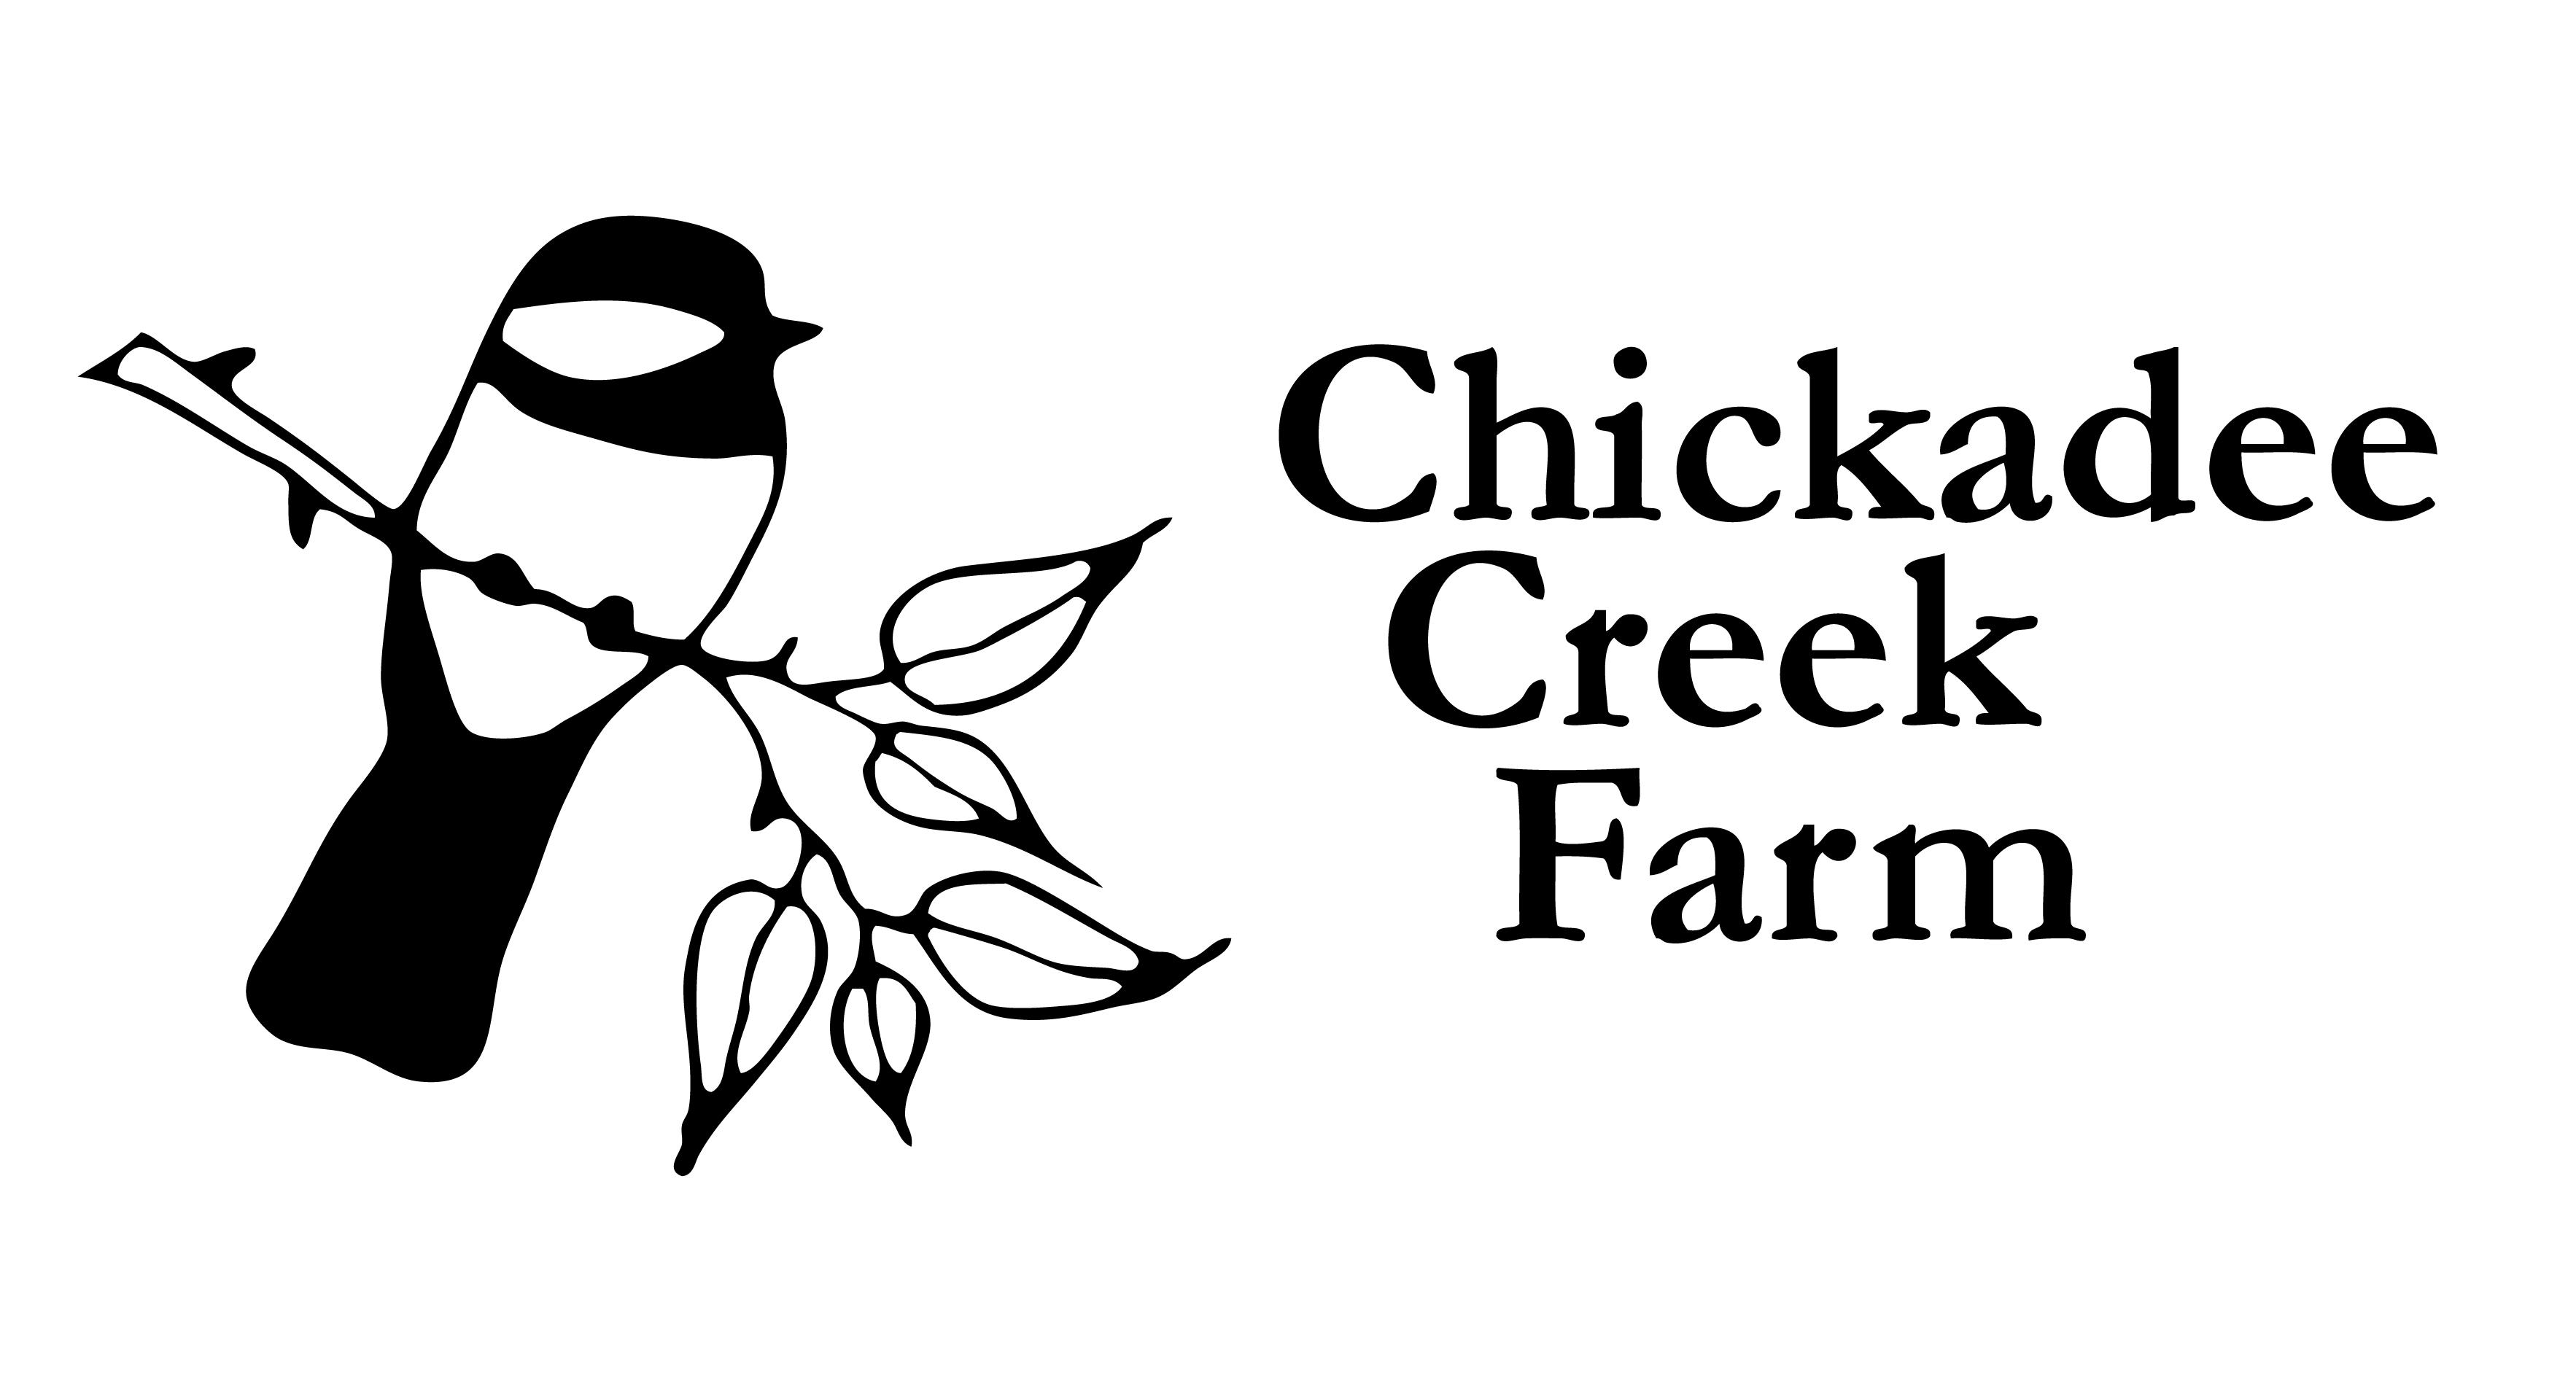 3532x1890 Chickadee Creek Farm Organic Vegetables, Herbs, And Flowers